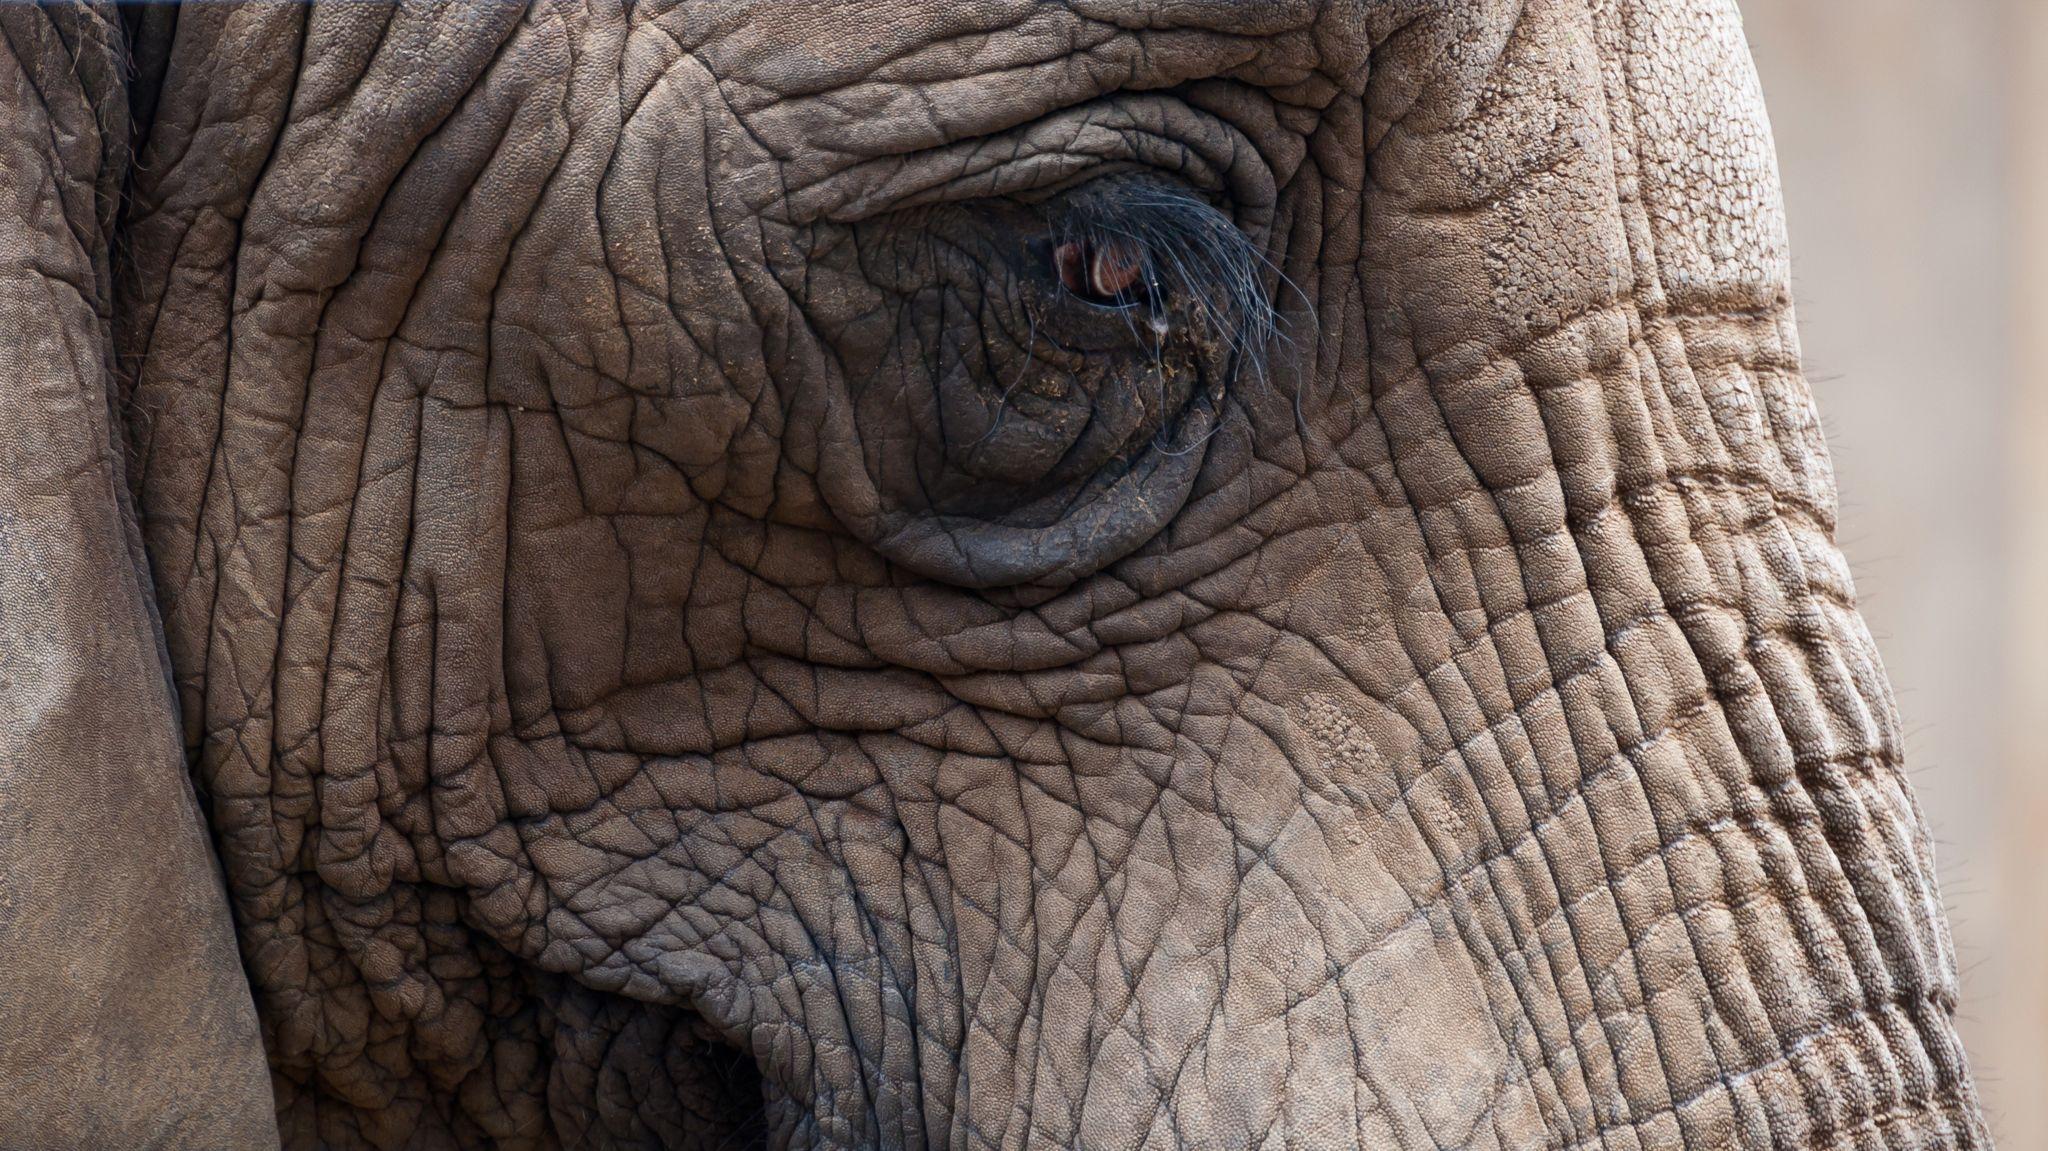 elephant-close-up